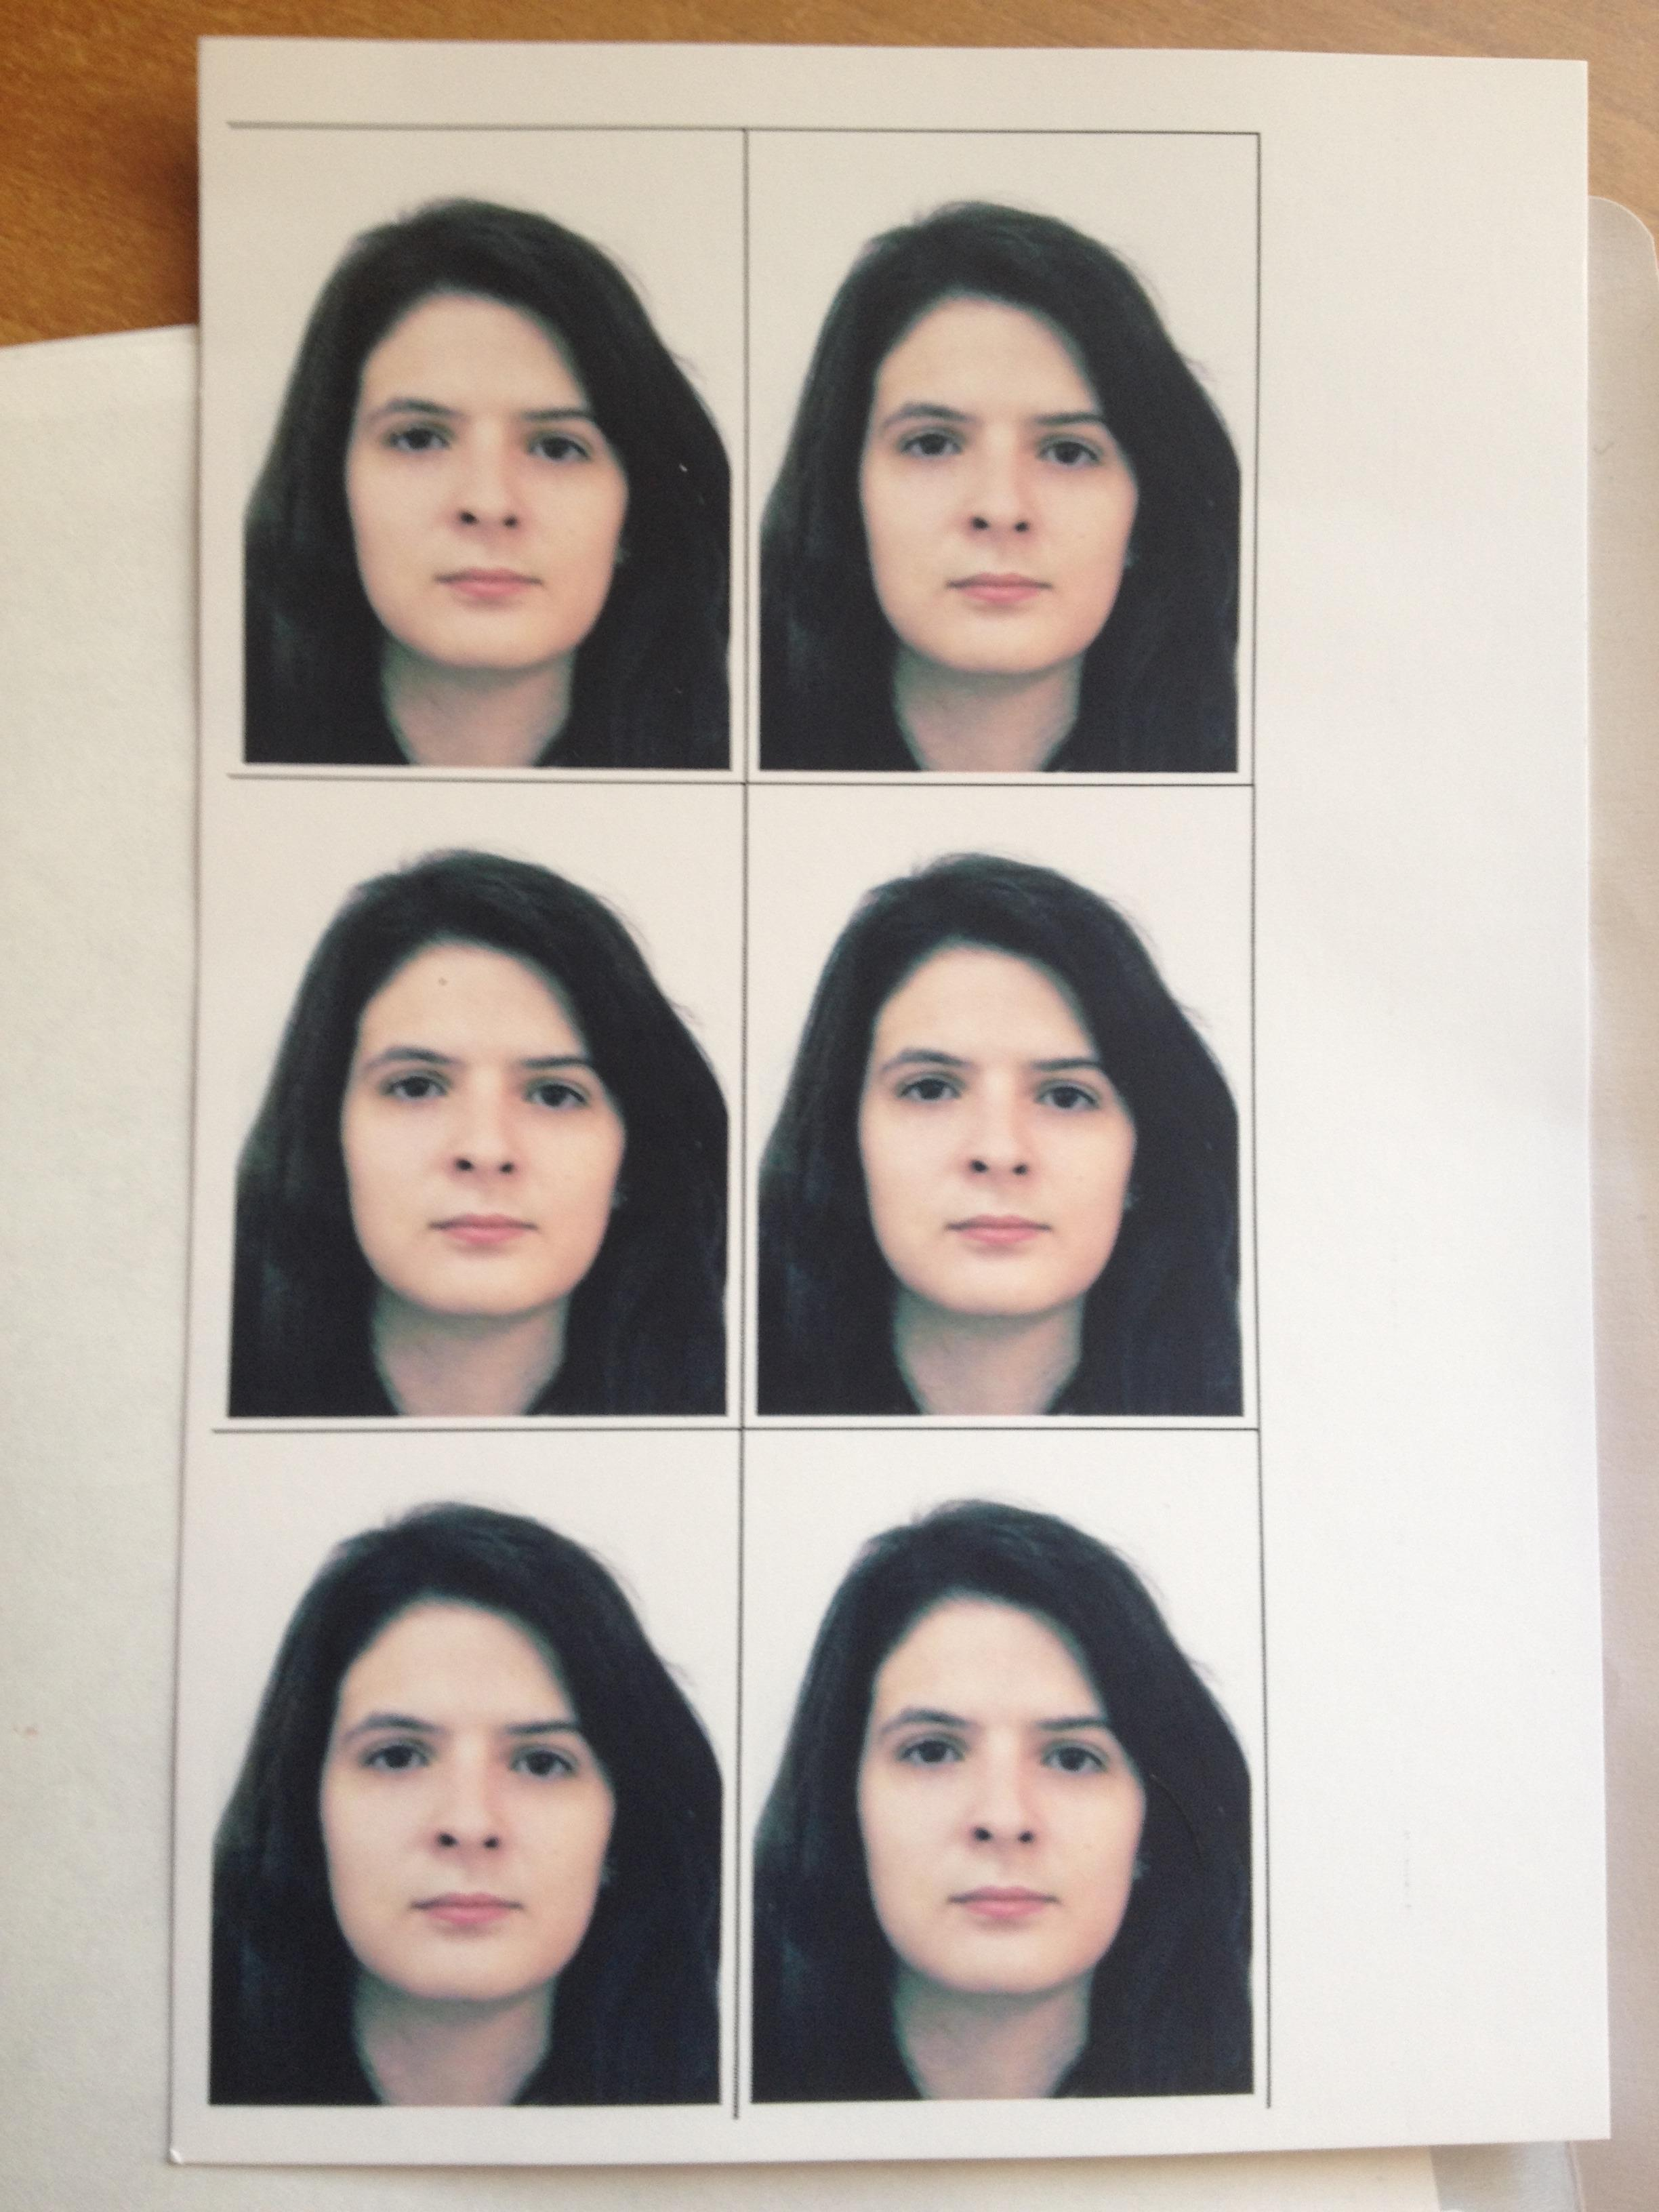 Фото на визу в домашних условиях